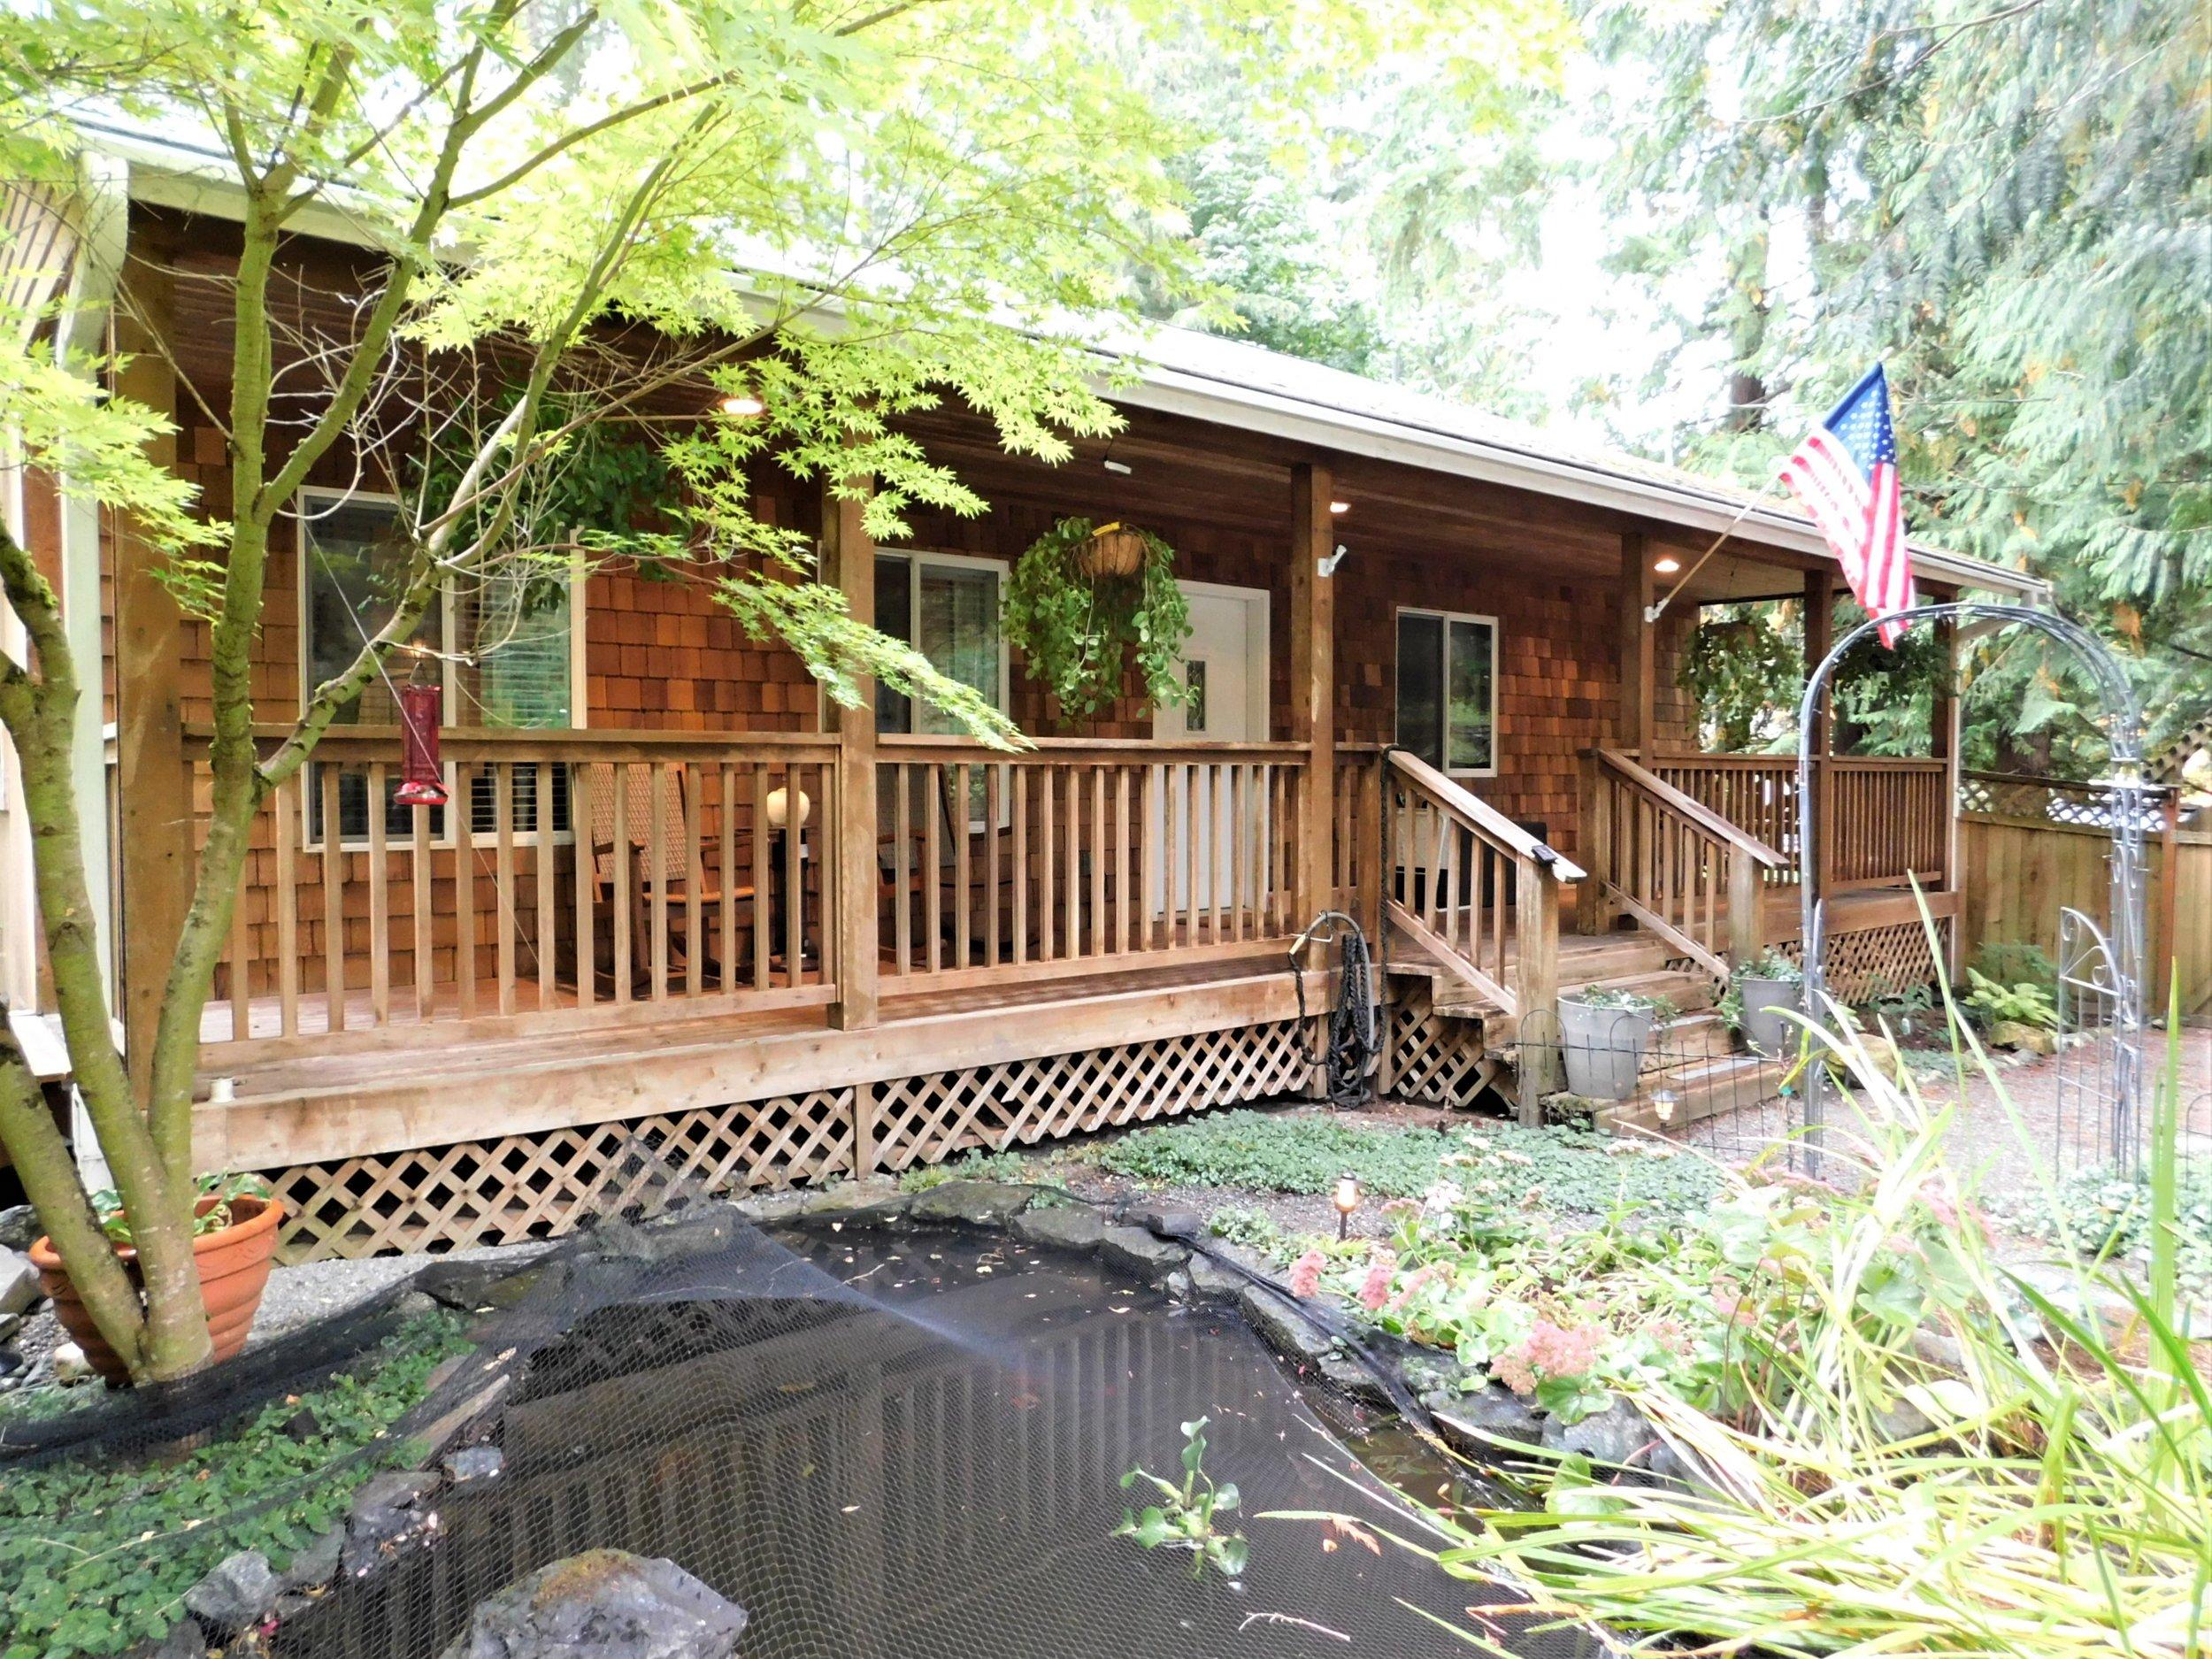 Clinton Retreat - 4141 Timberline Rd, Clinton WA